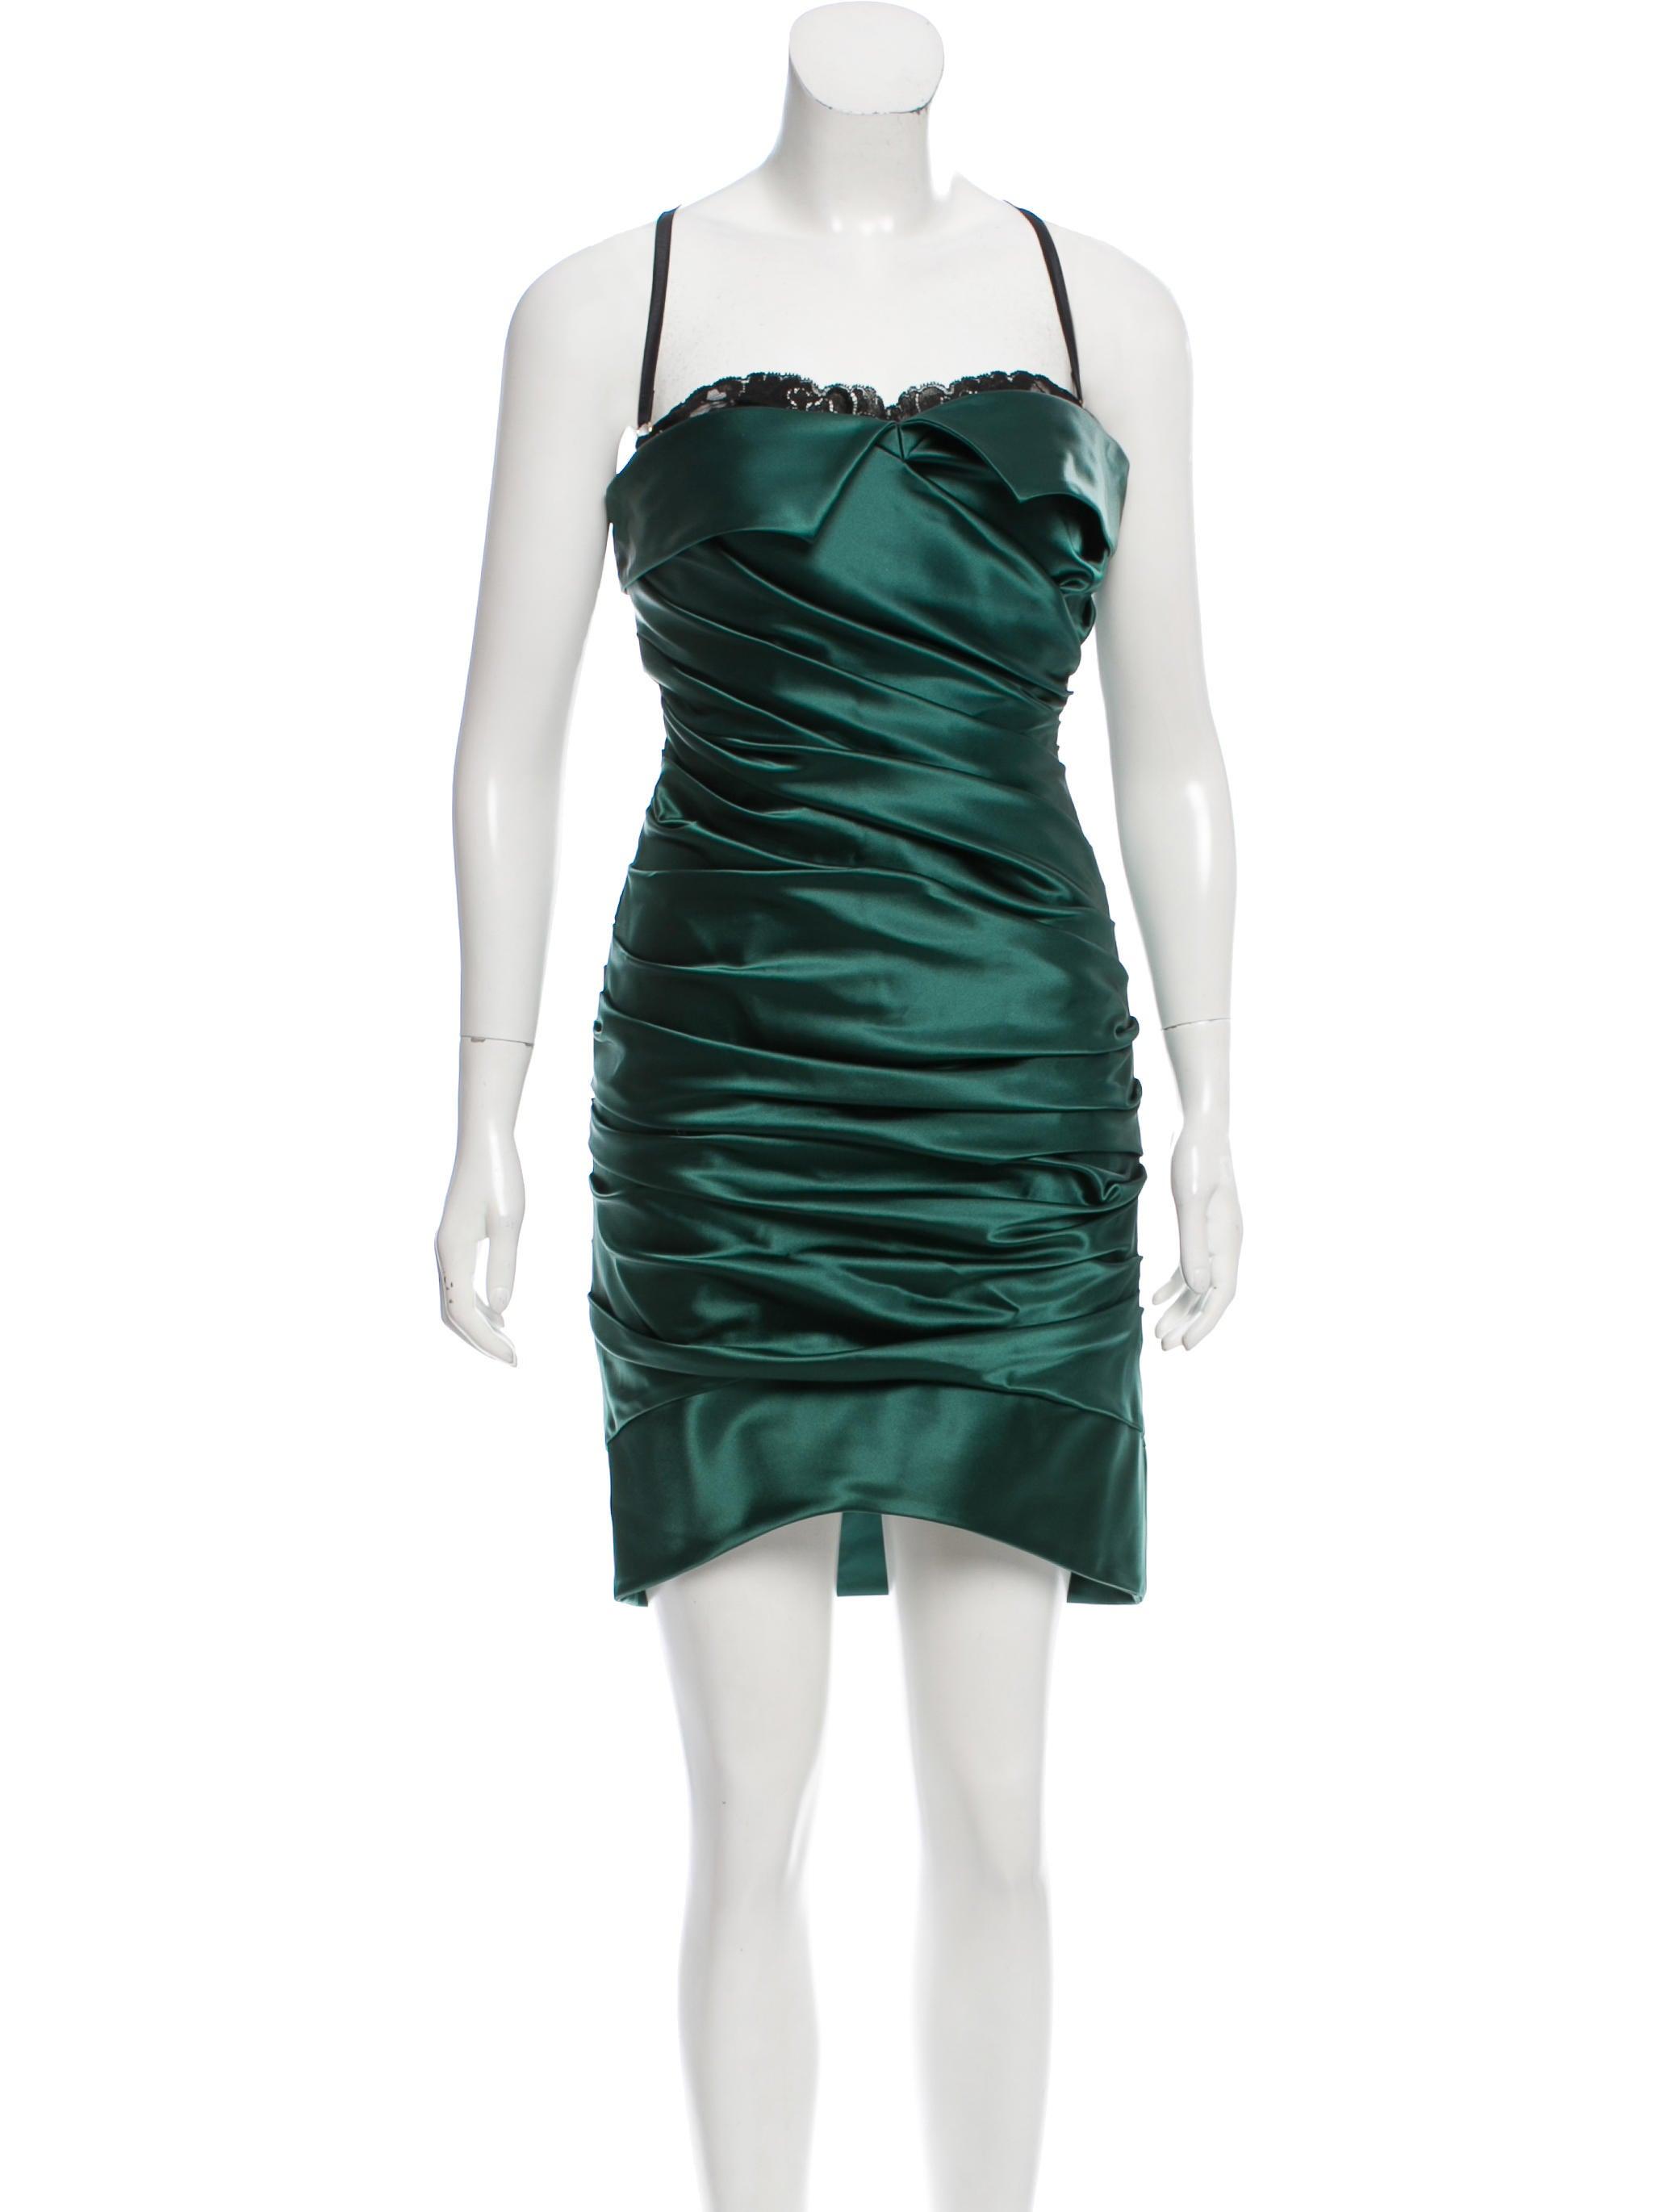 81f075d7c22 Dolce   Gabbana Satin Cocktail Dress - Clothing - DAG81384